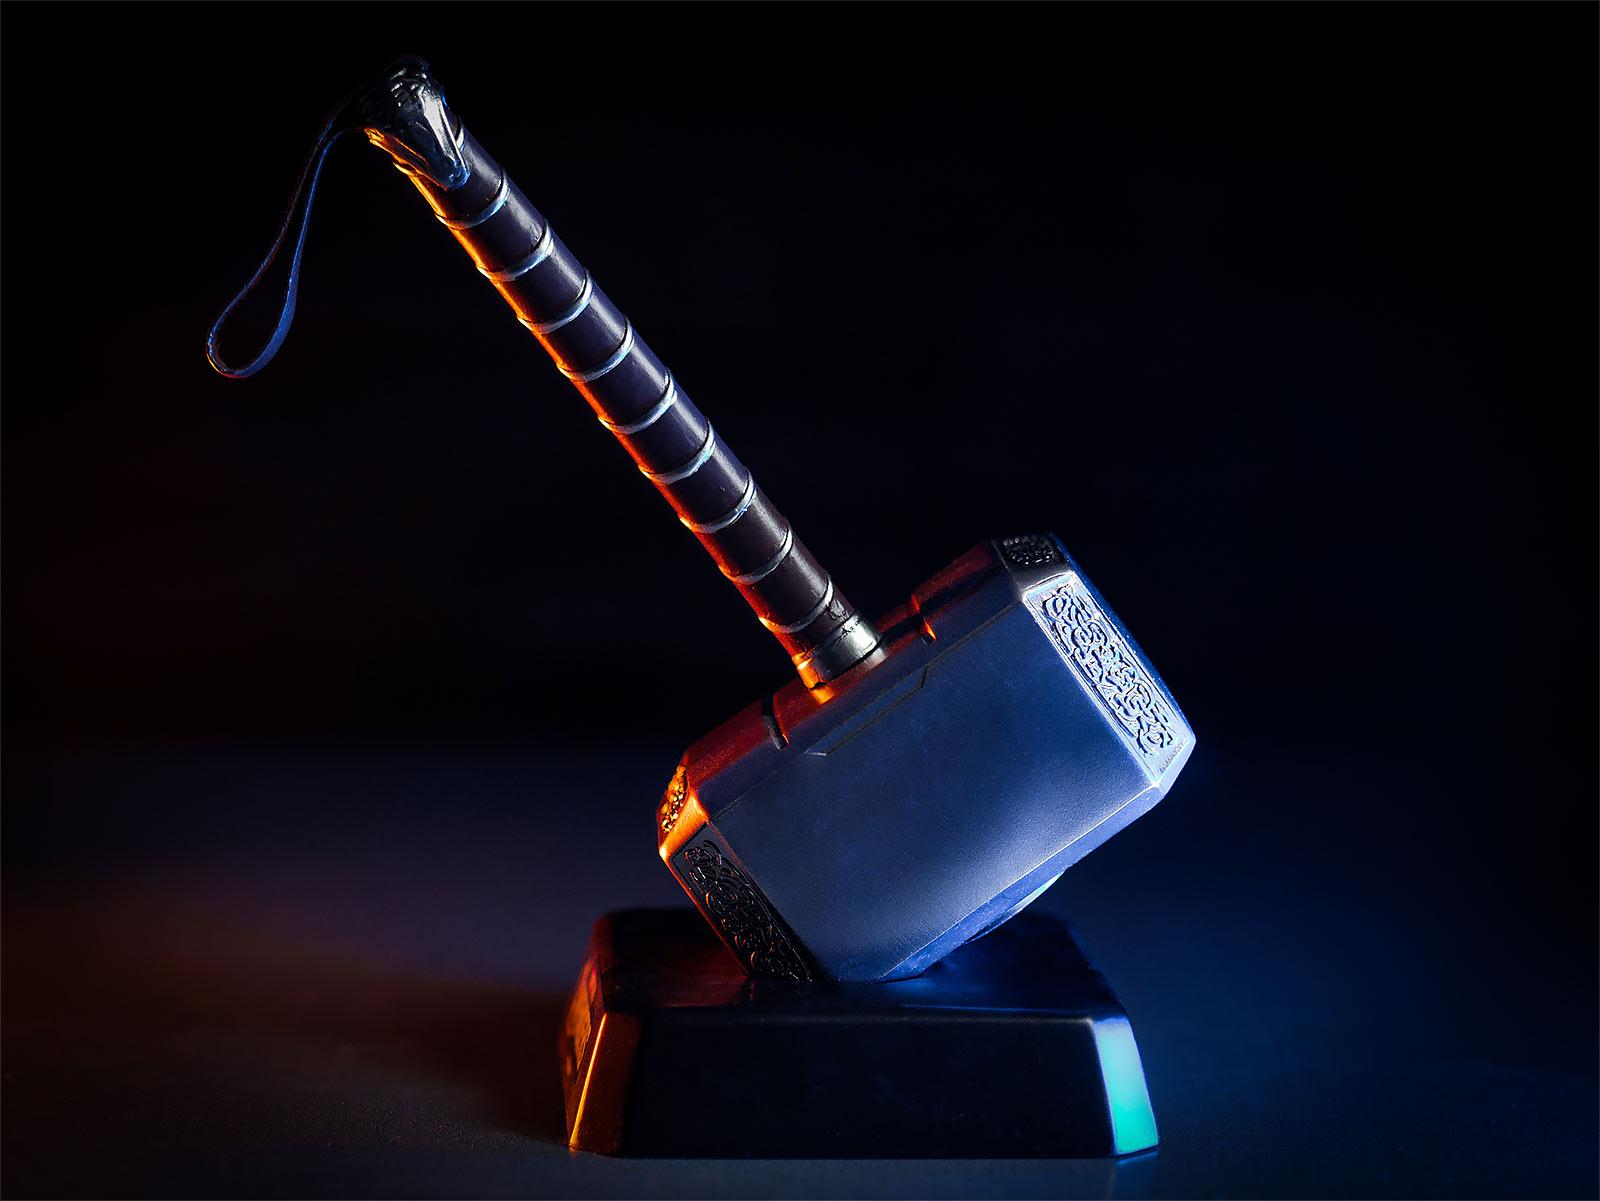 Thor - Mjölnir Hammer Replik Marvel Museum Collection